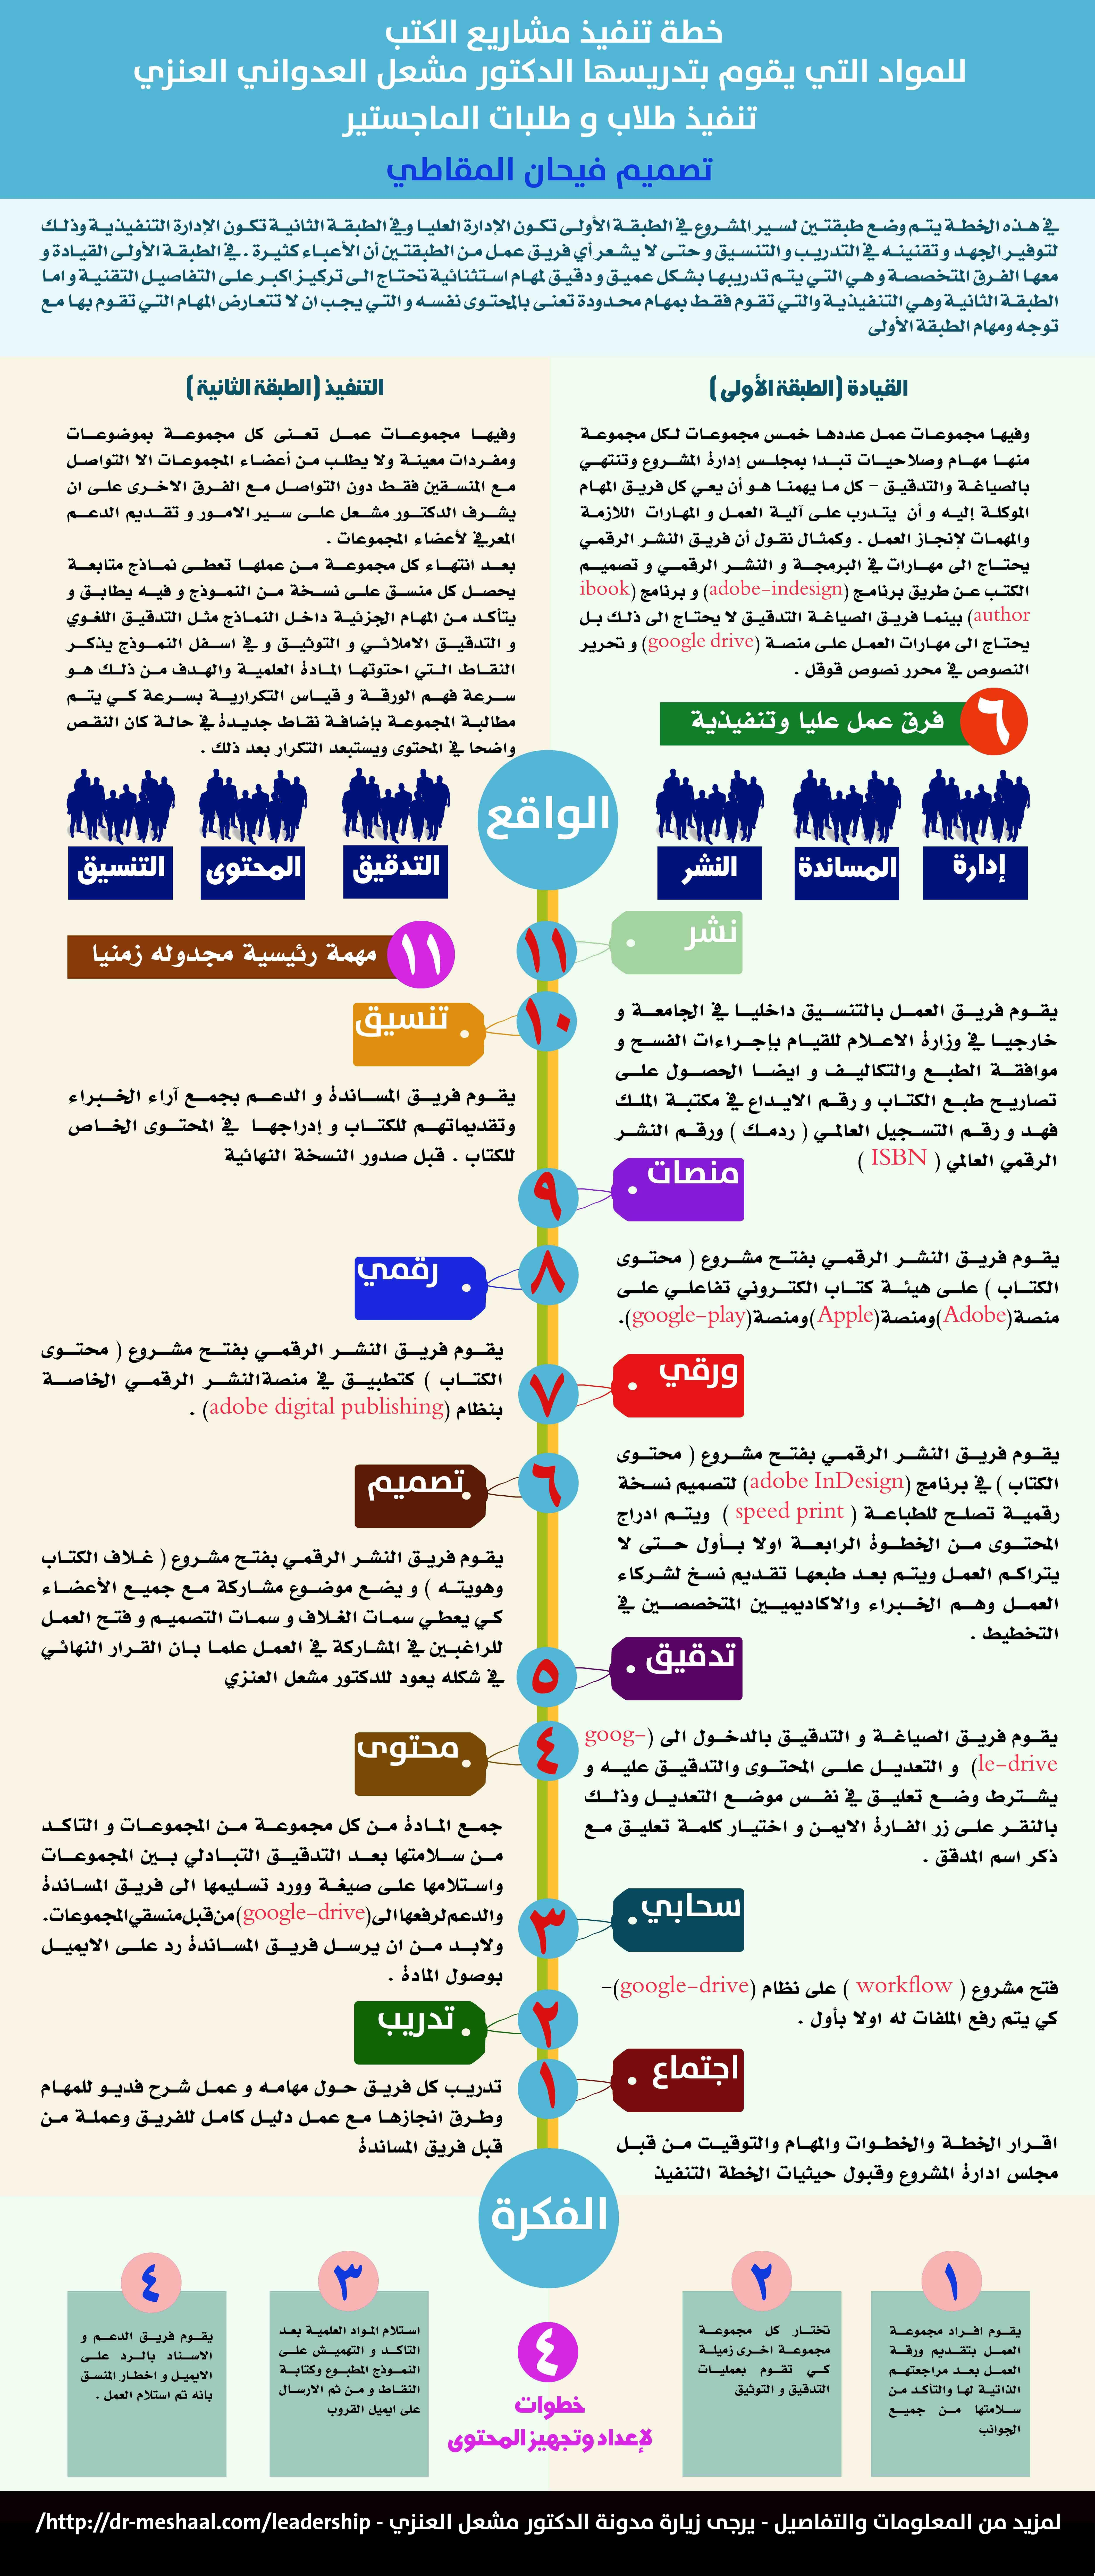 Pin By Fayhan Alotibi On جامعة الامام Asphalt Paving Company Infographic Paving